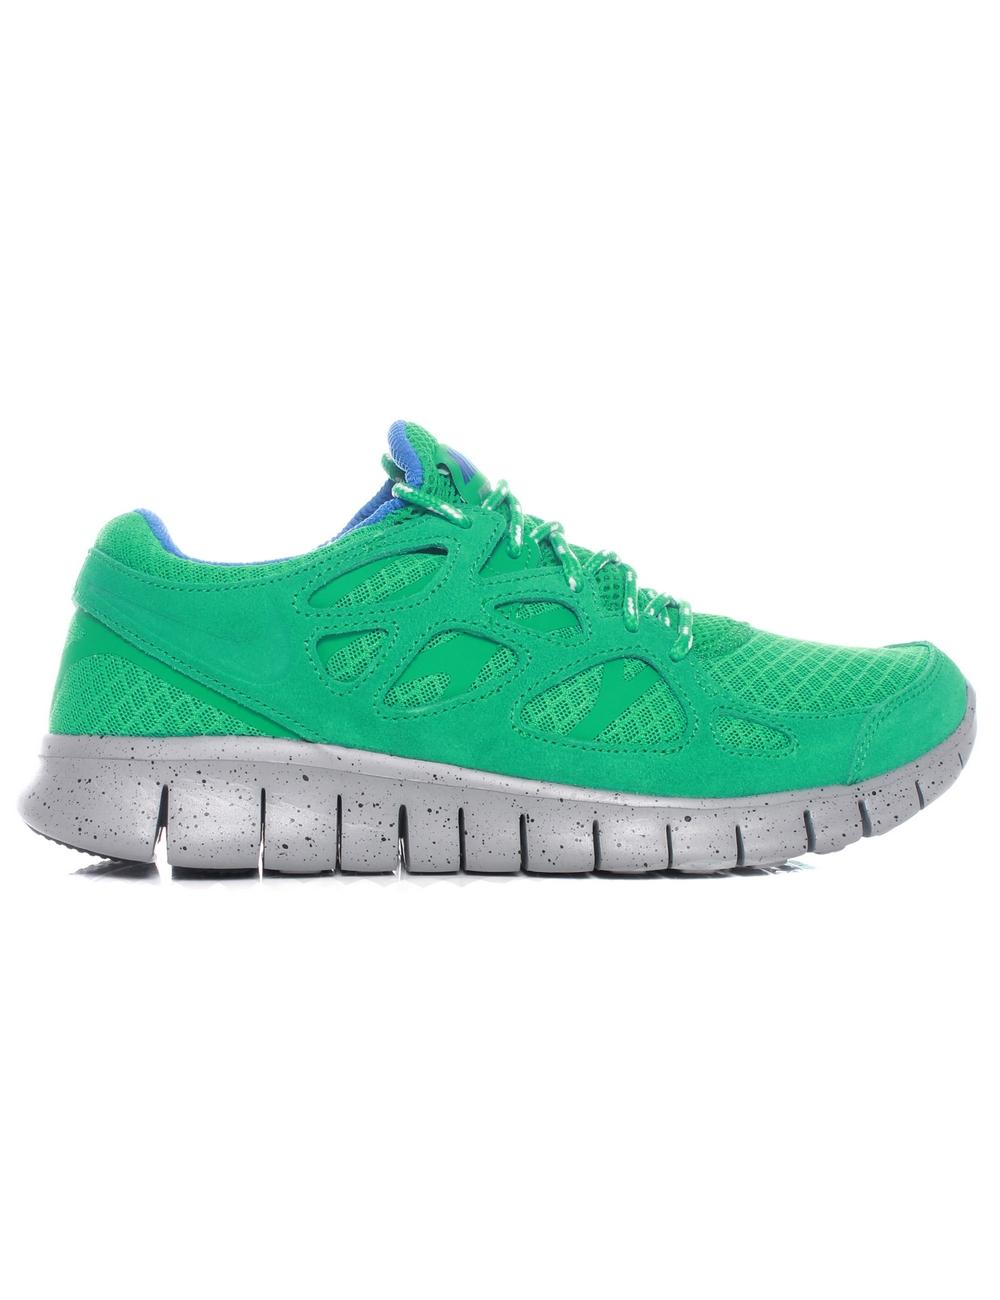 premium selection add92 42077 Mens Nike Free Run 3 Anti-Fur SG67